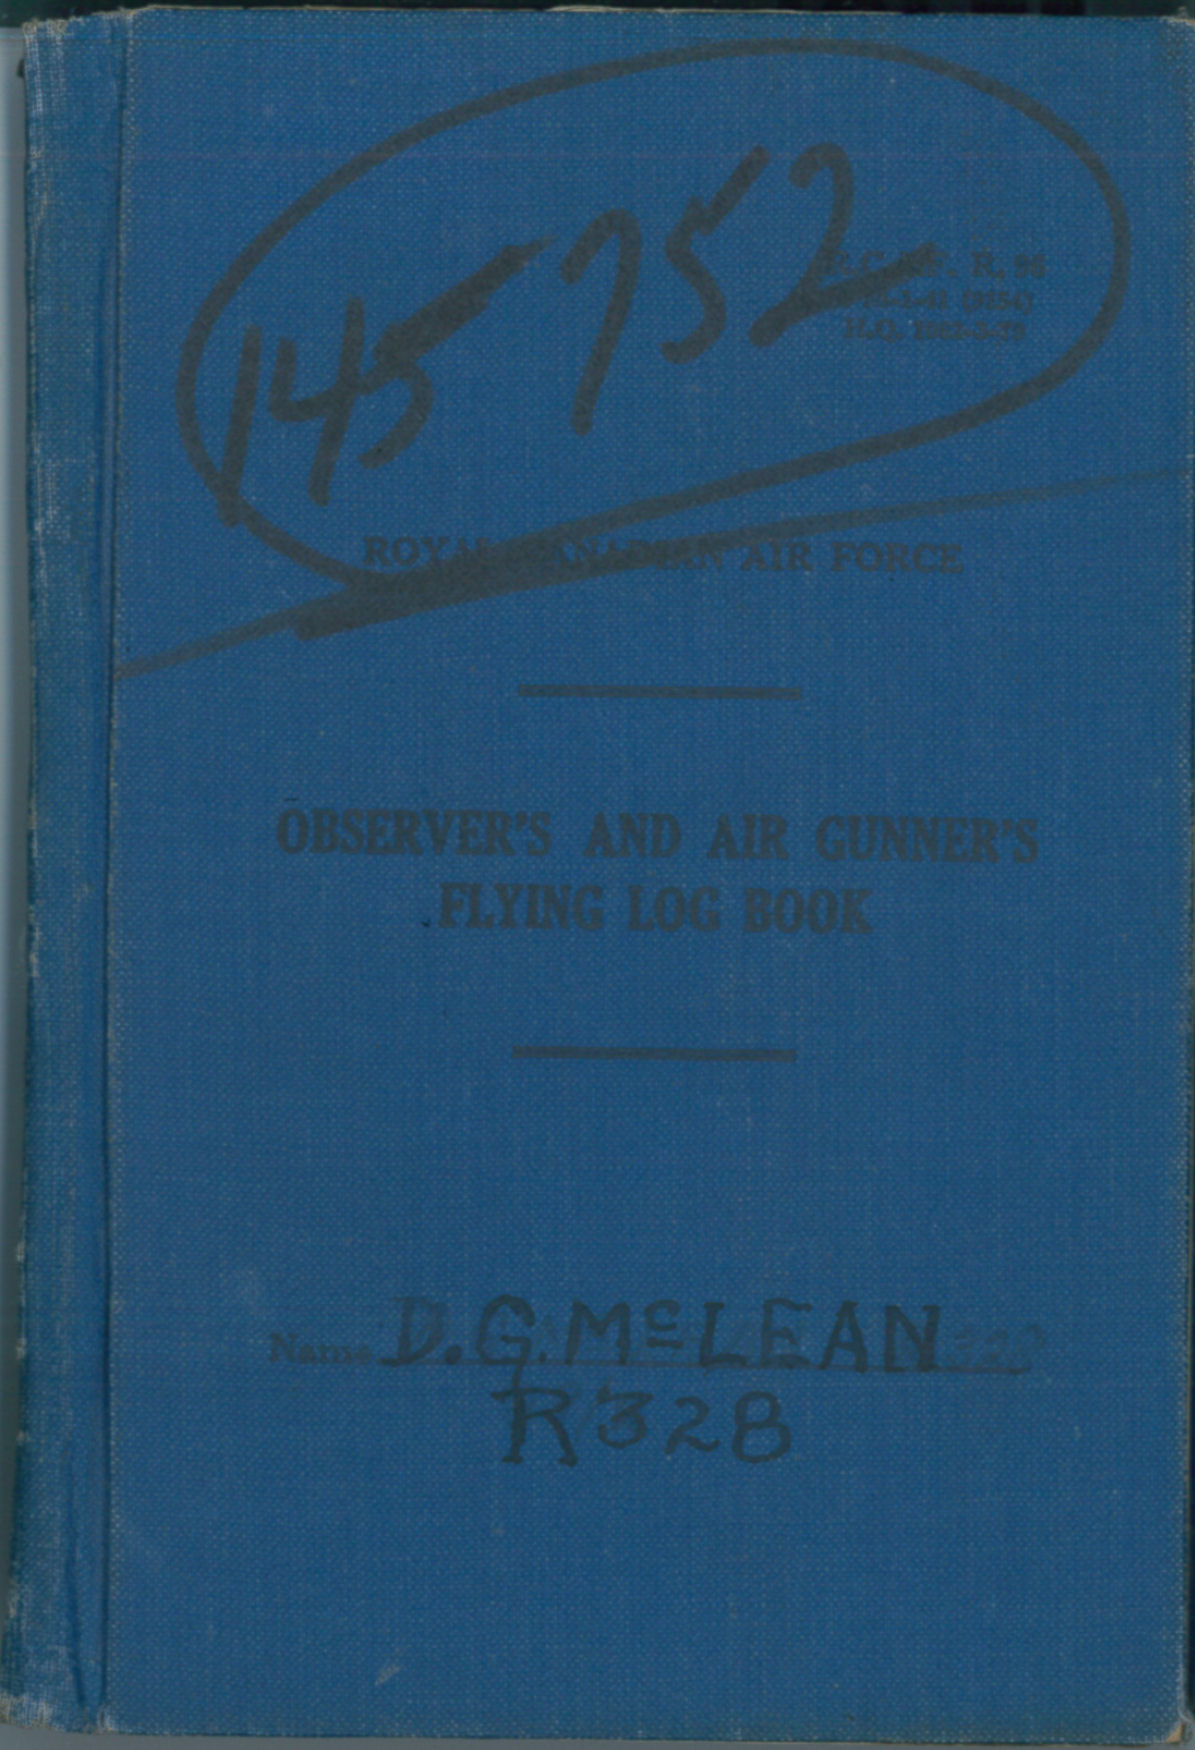 Flight Log Book